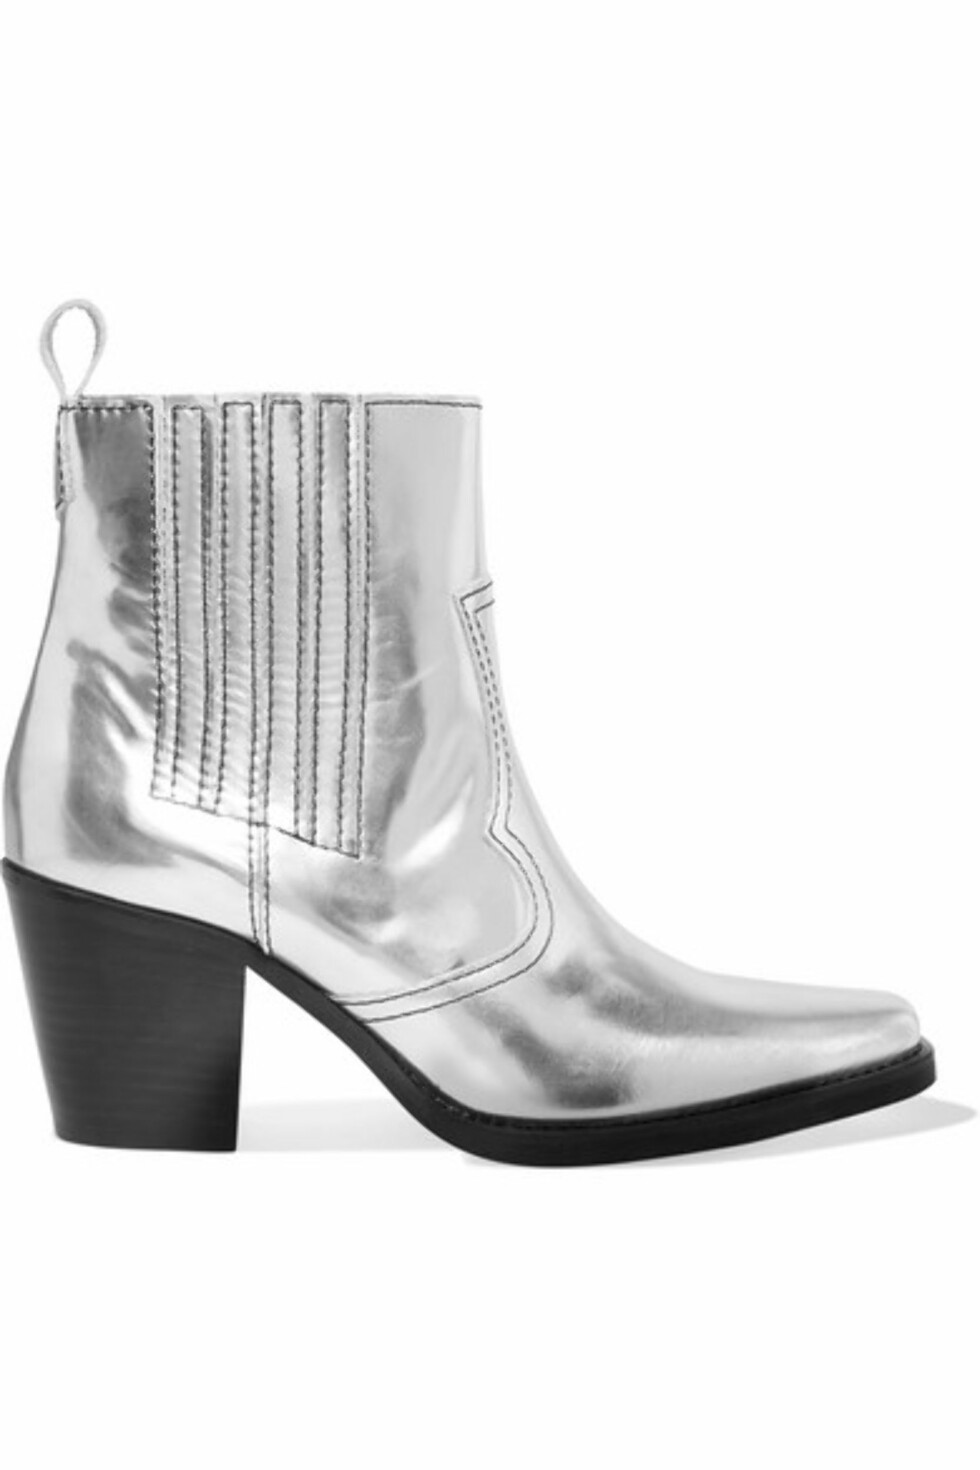 Ganni via Net-a-porter |4000,-| https://www.net-a-porter.com/no/en/product/985849/ganni/callie-metallic-leather-ankle-boots